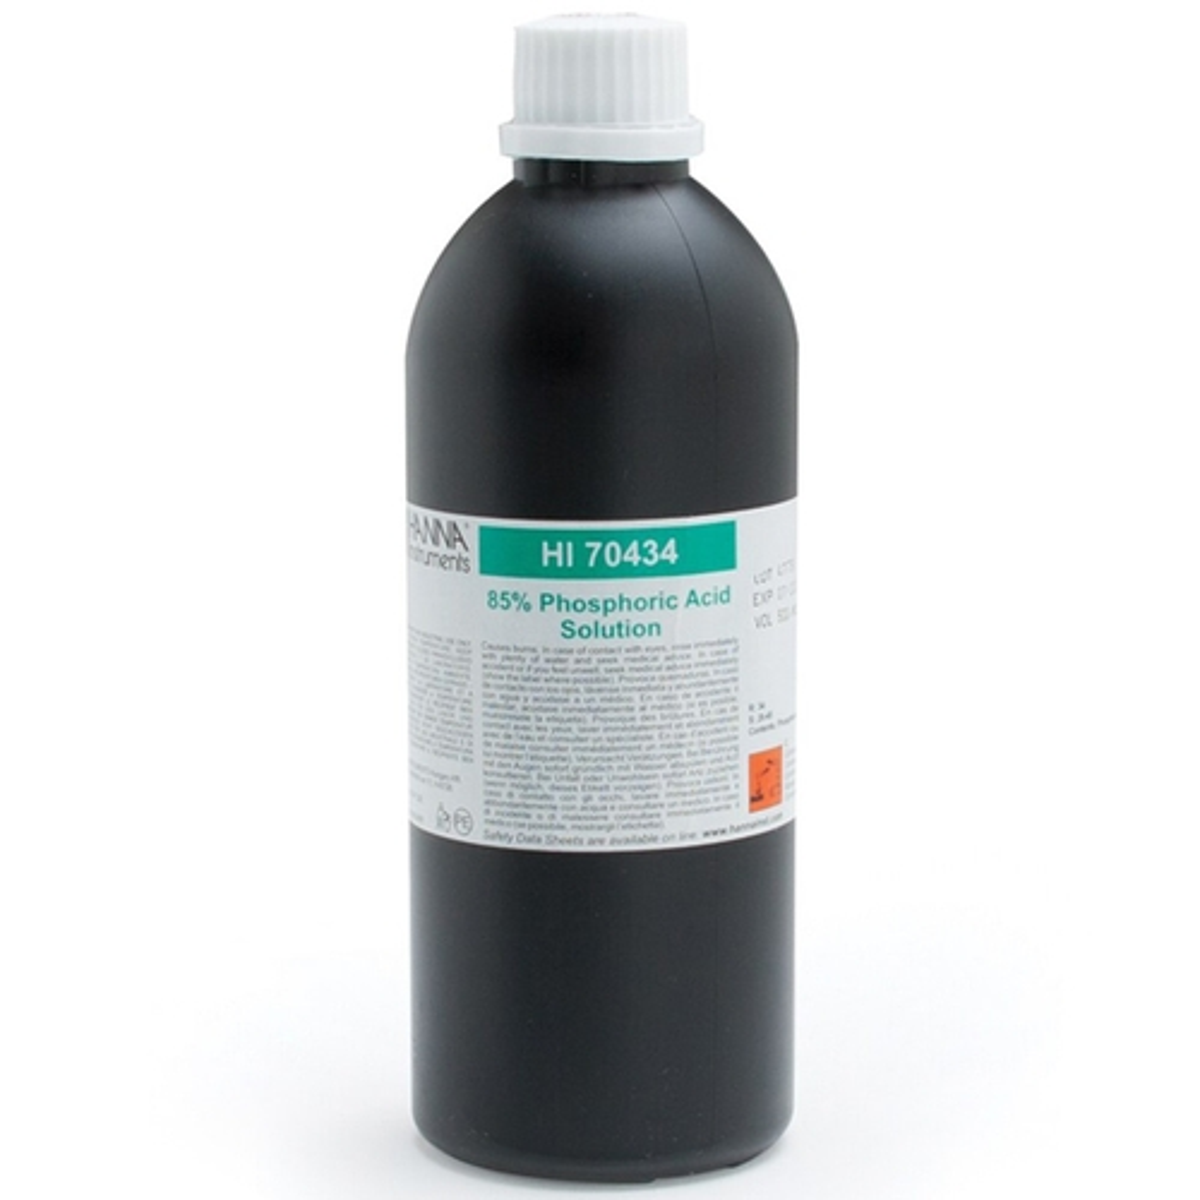 Sodium Hydroxide Solution 5M, 500 mL - HI70435